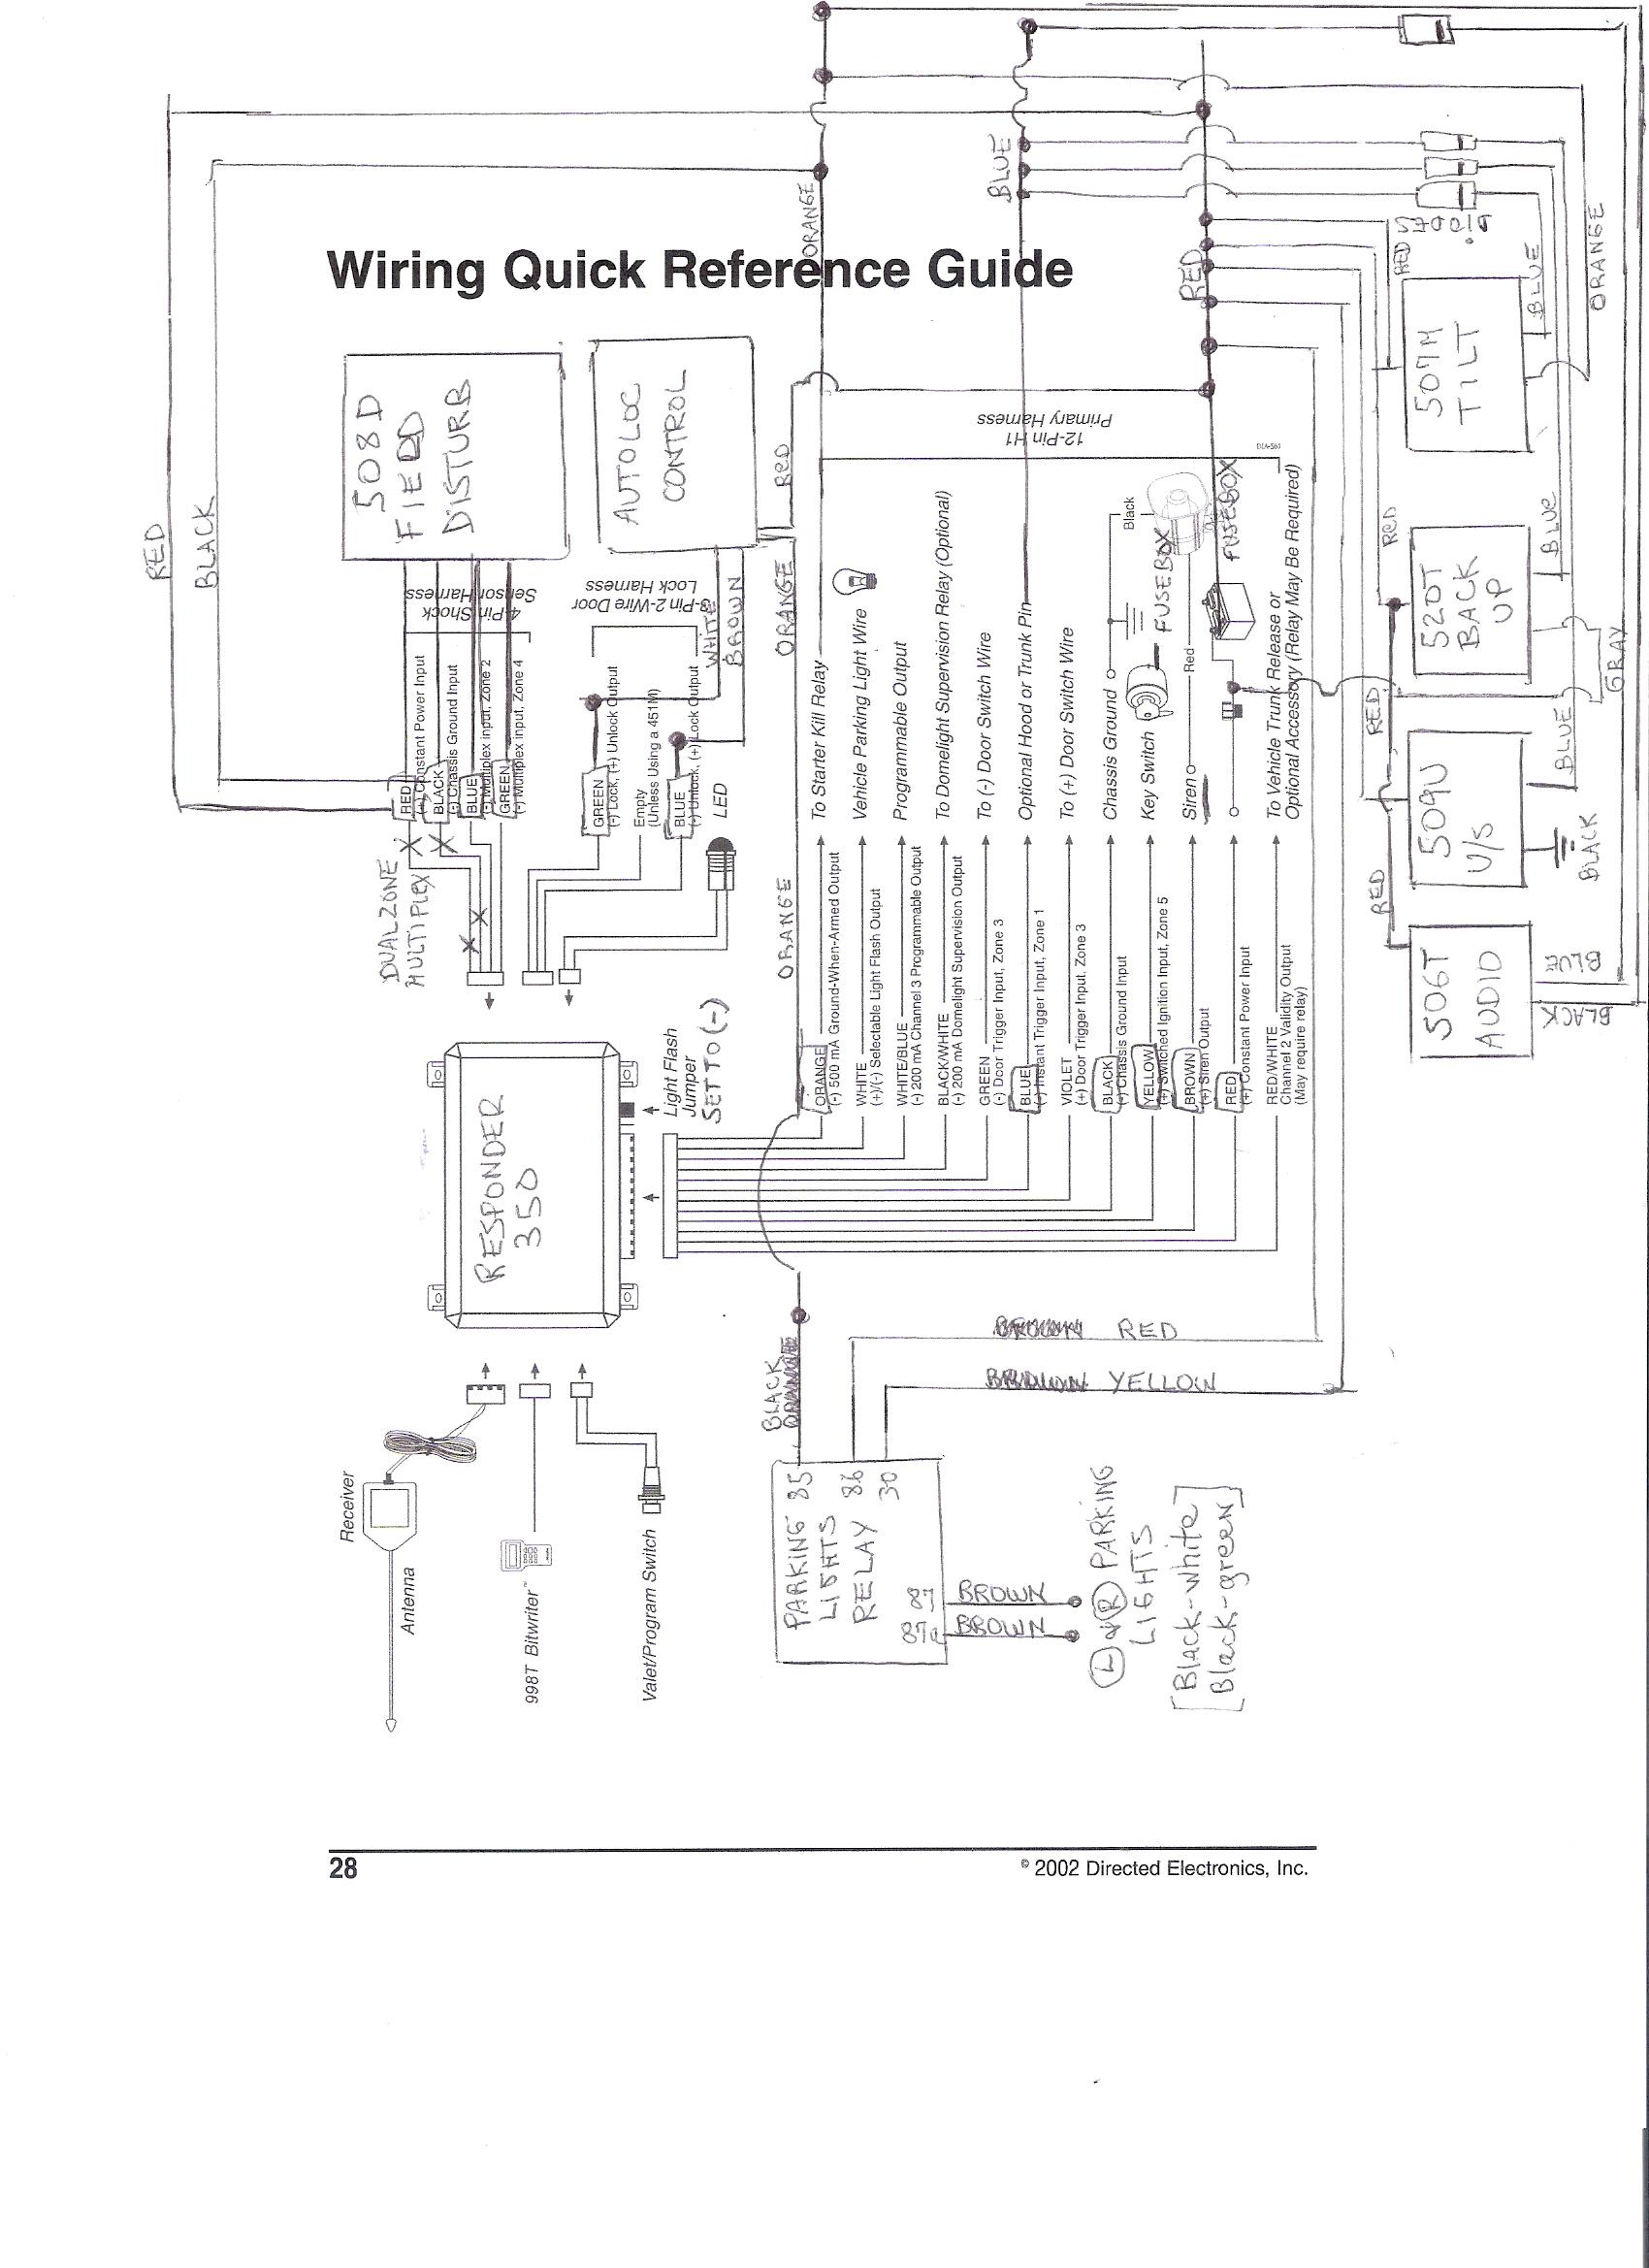 Wiring Autoloc Diagram Autsvpro34dlbkautoloc Diagrams Svpro5 Nice Door Popper Pictures Electrical